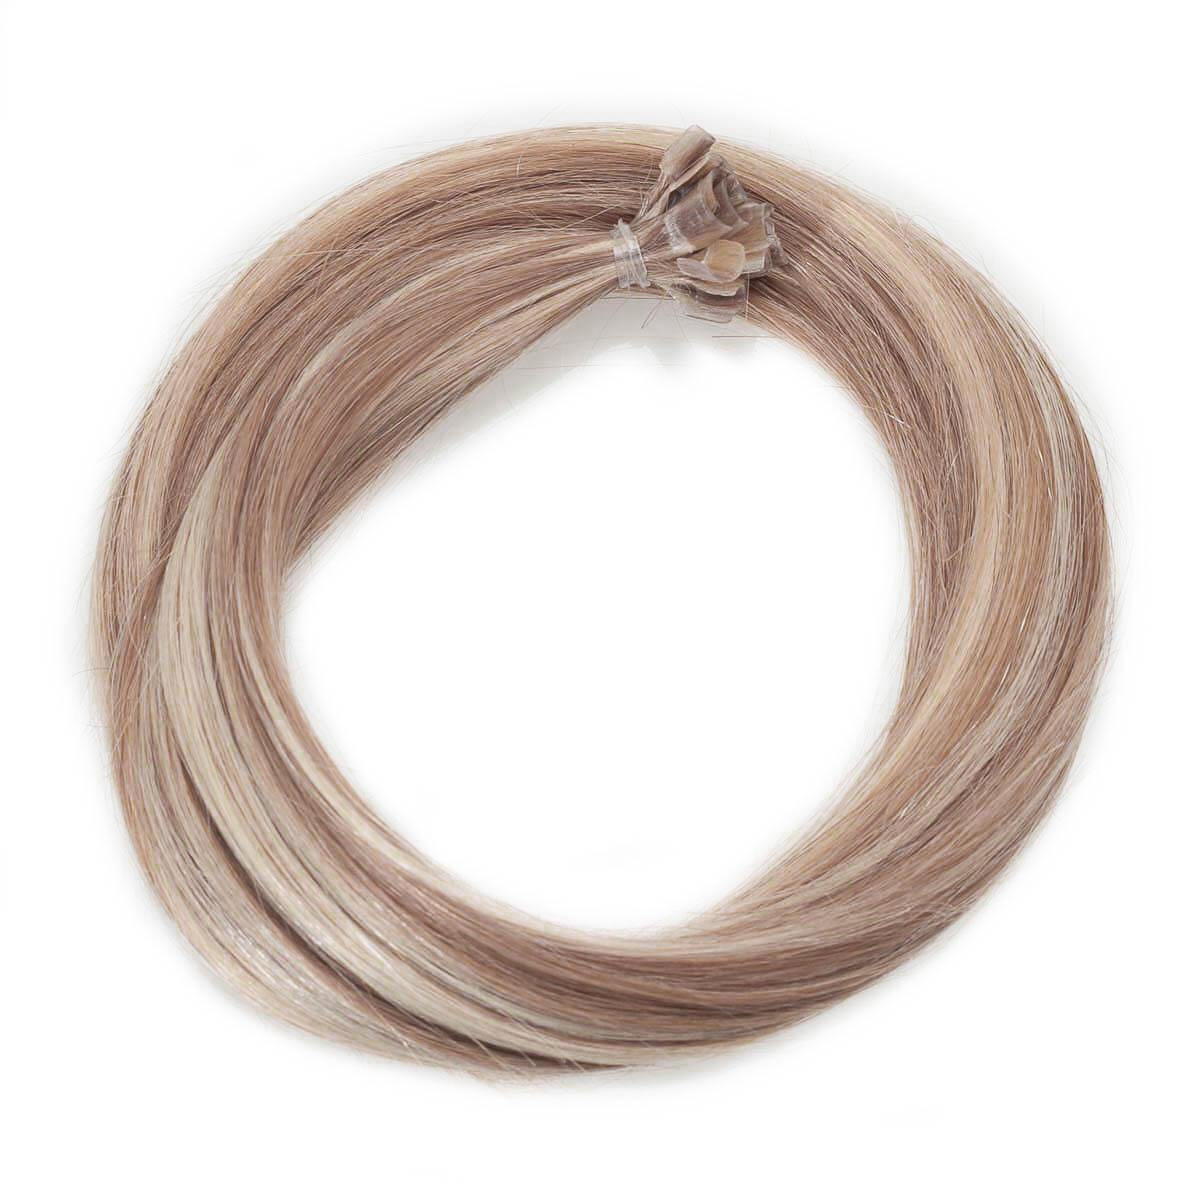 Nail Hair M7.3/10.8 Cendre Ash Blonde Mix 30 cm